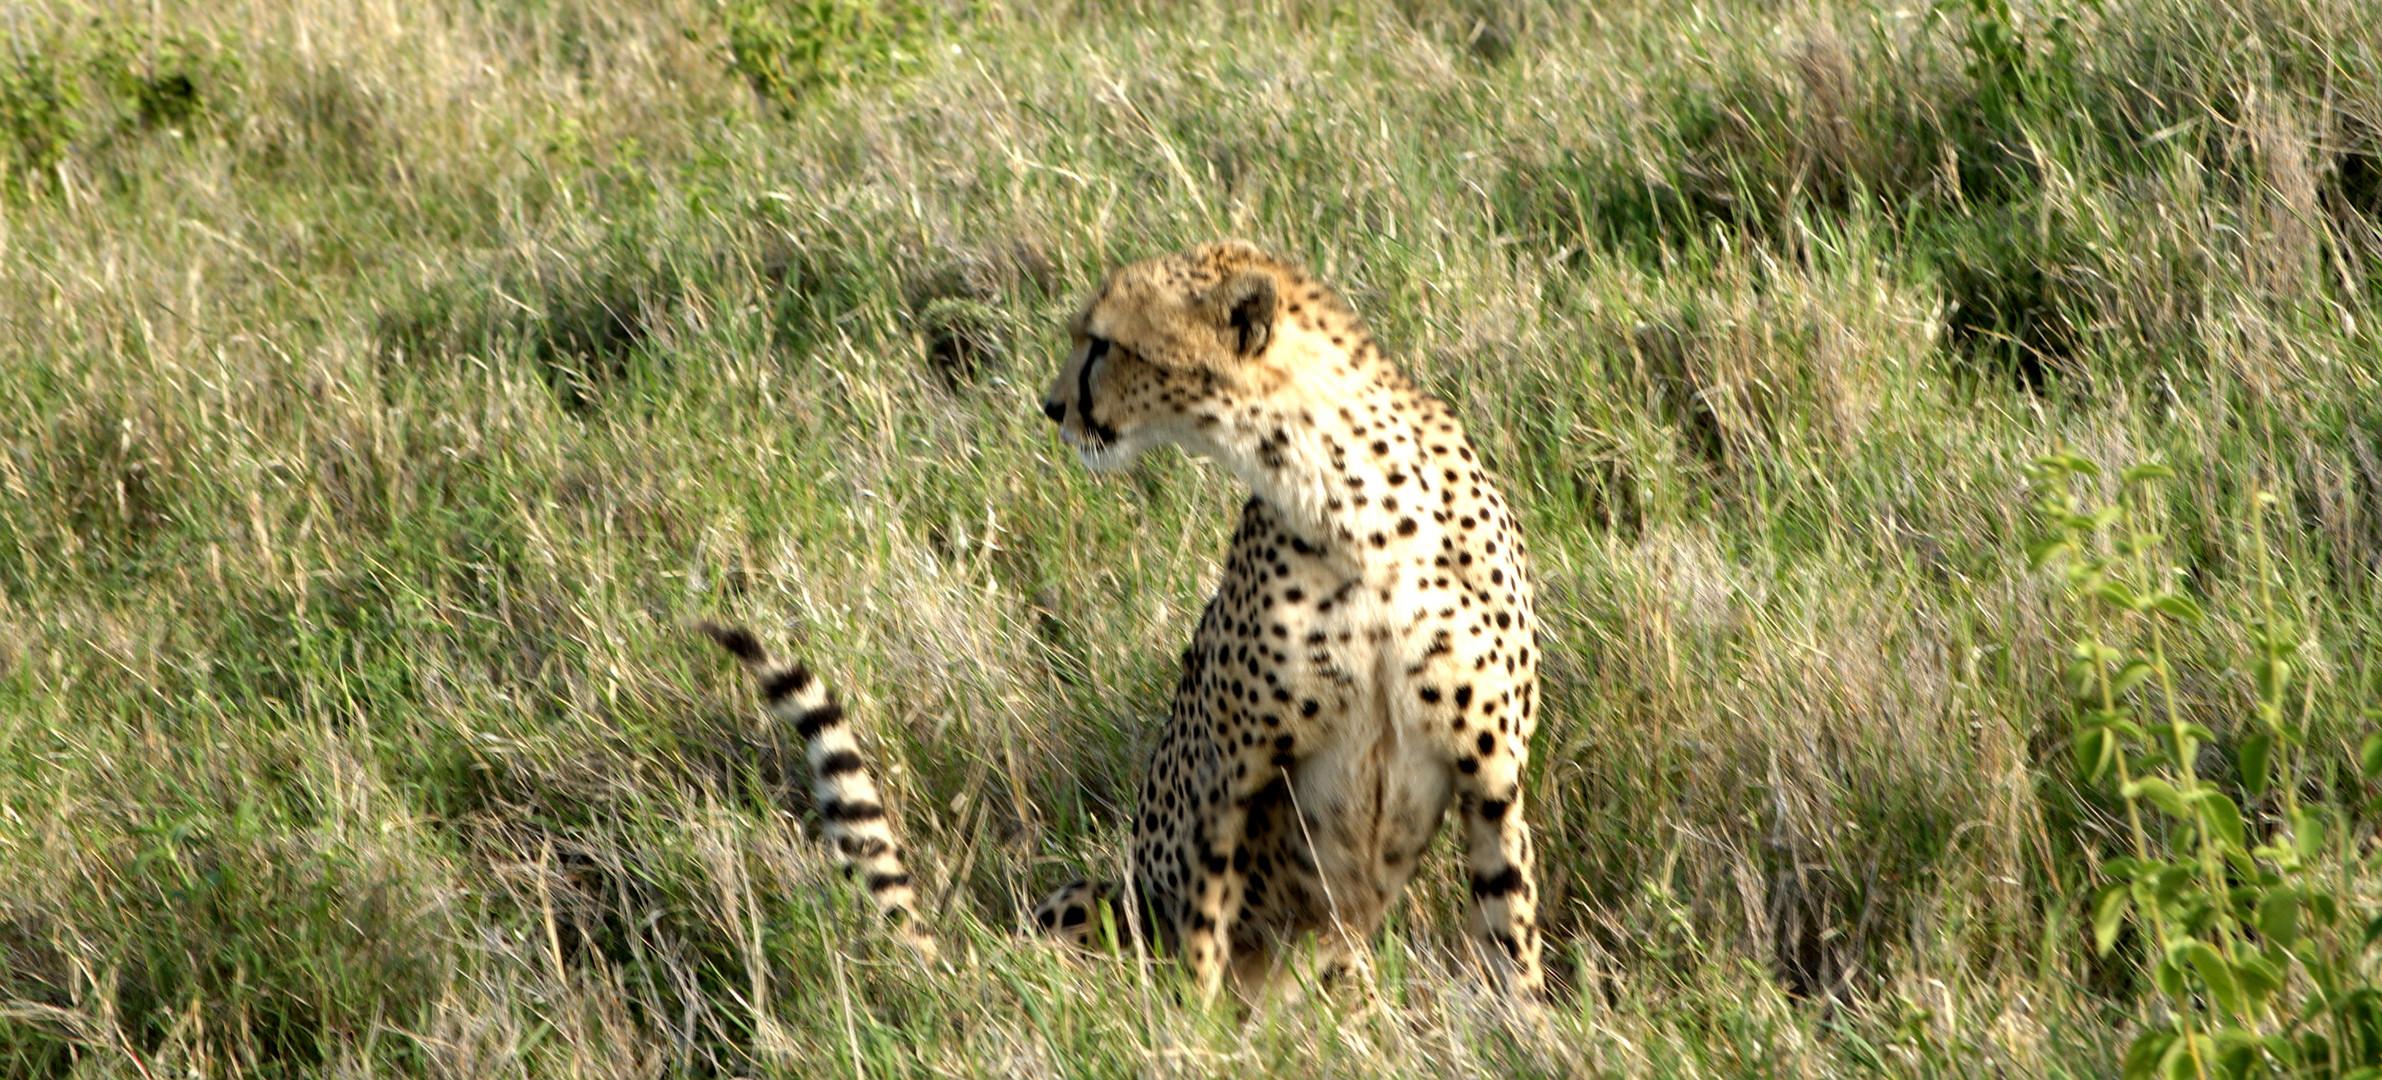 Gepardin, Lewa Downs